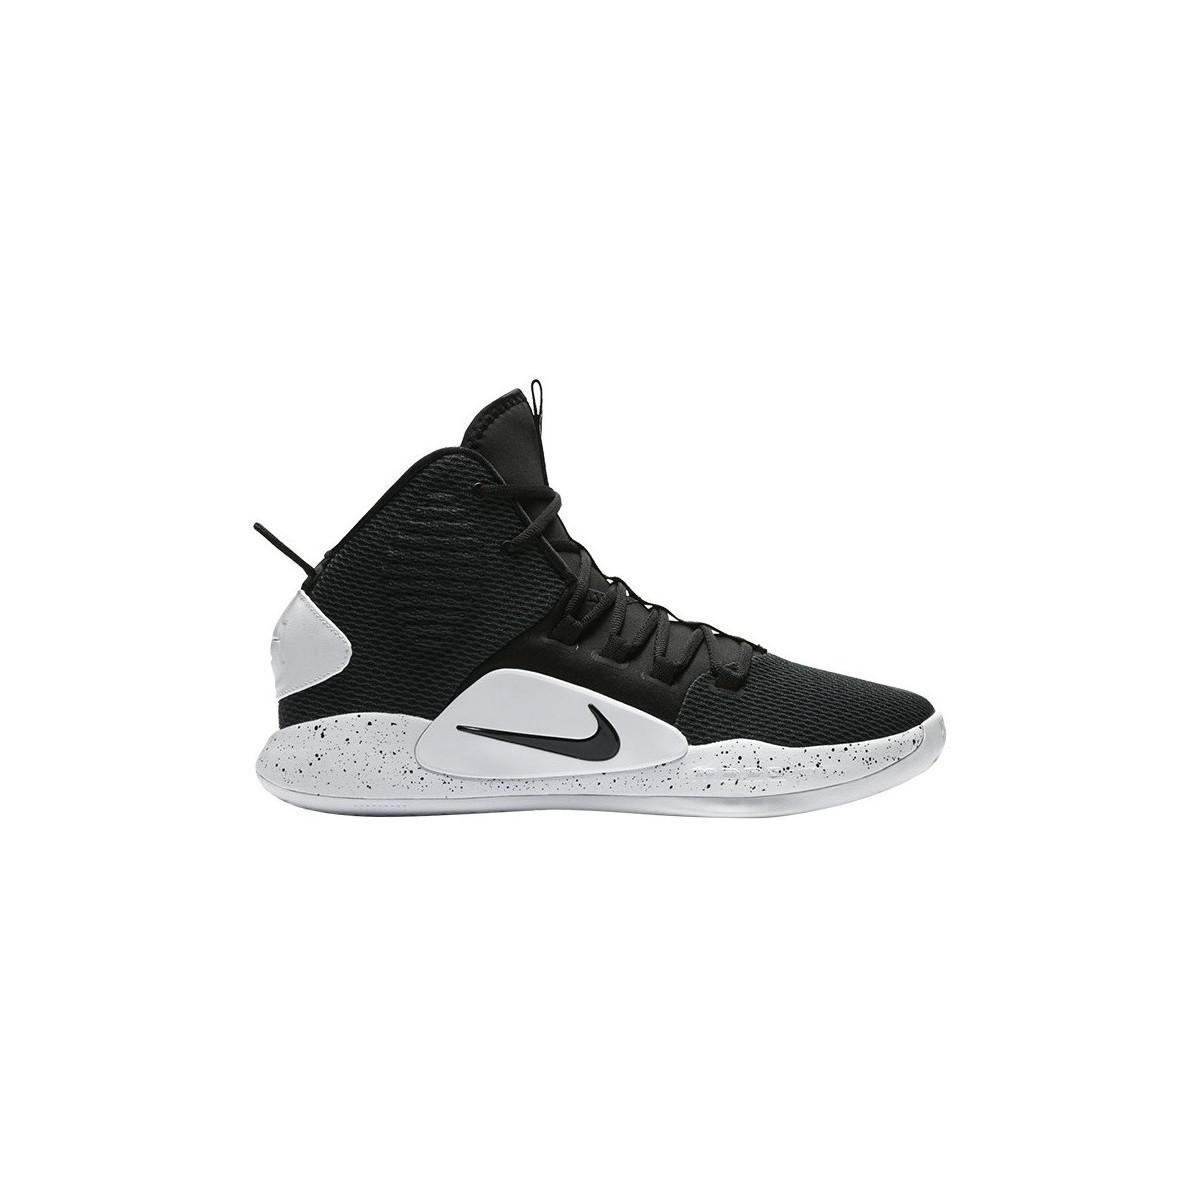 e3814d803e48 Nike Hyperdunk X Men s Shoes (high-top Trainers) In Black in Black ...